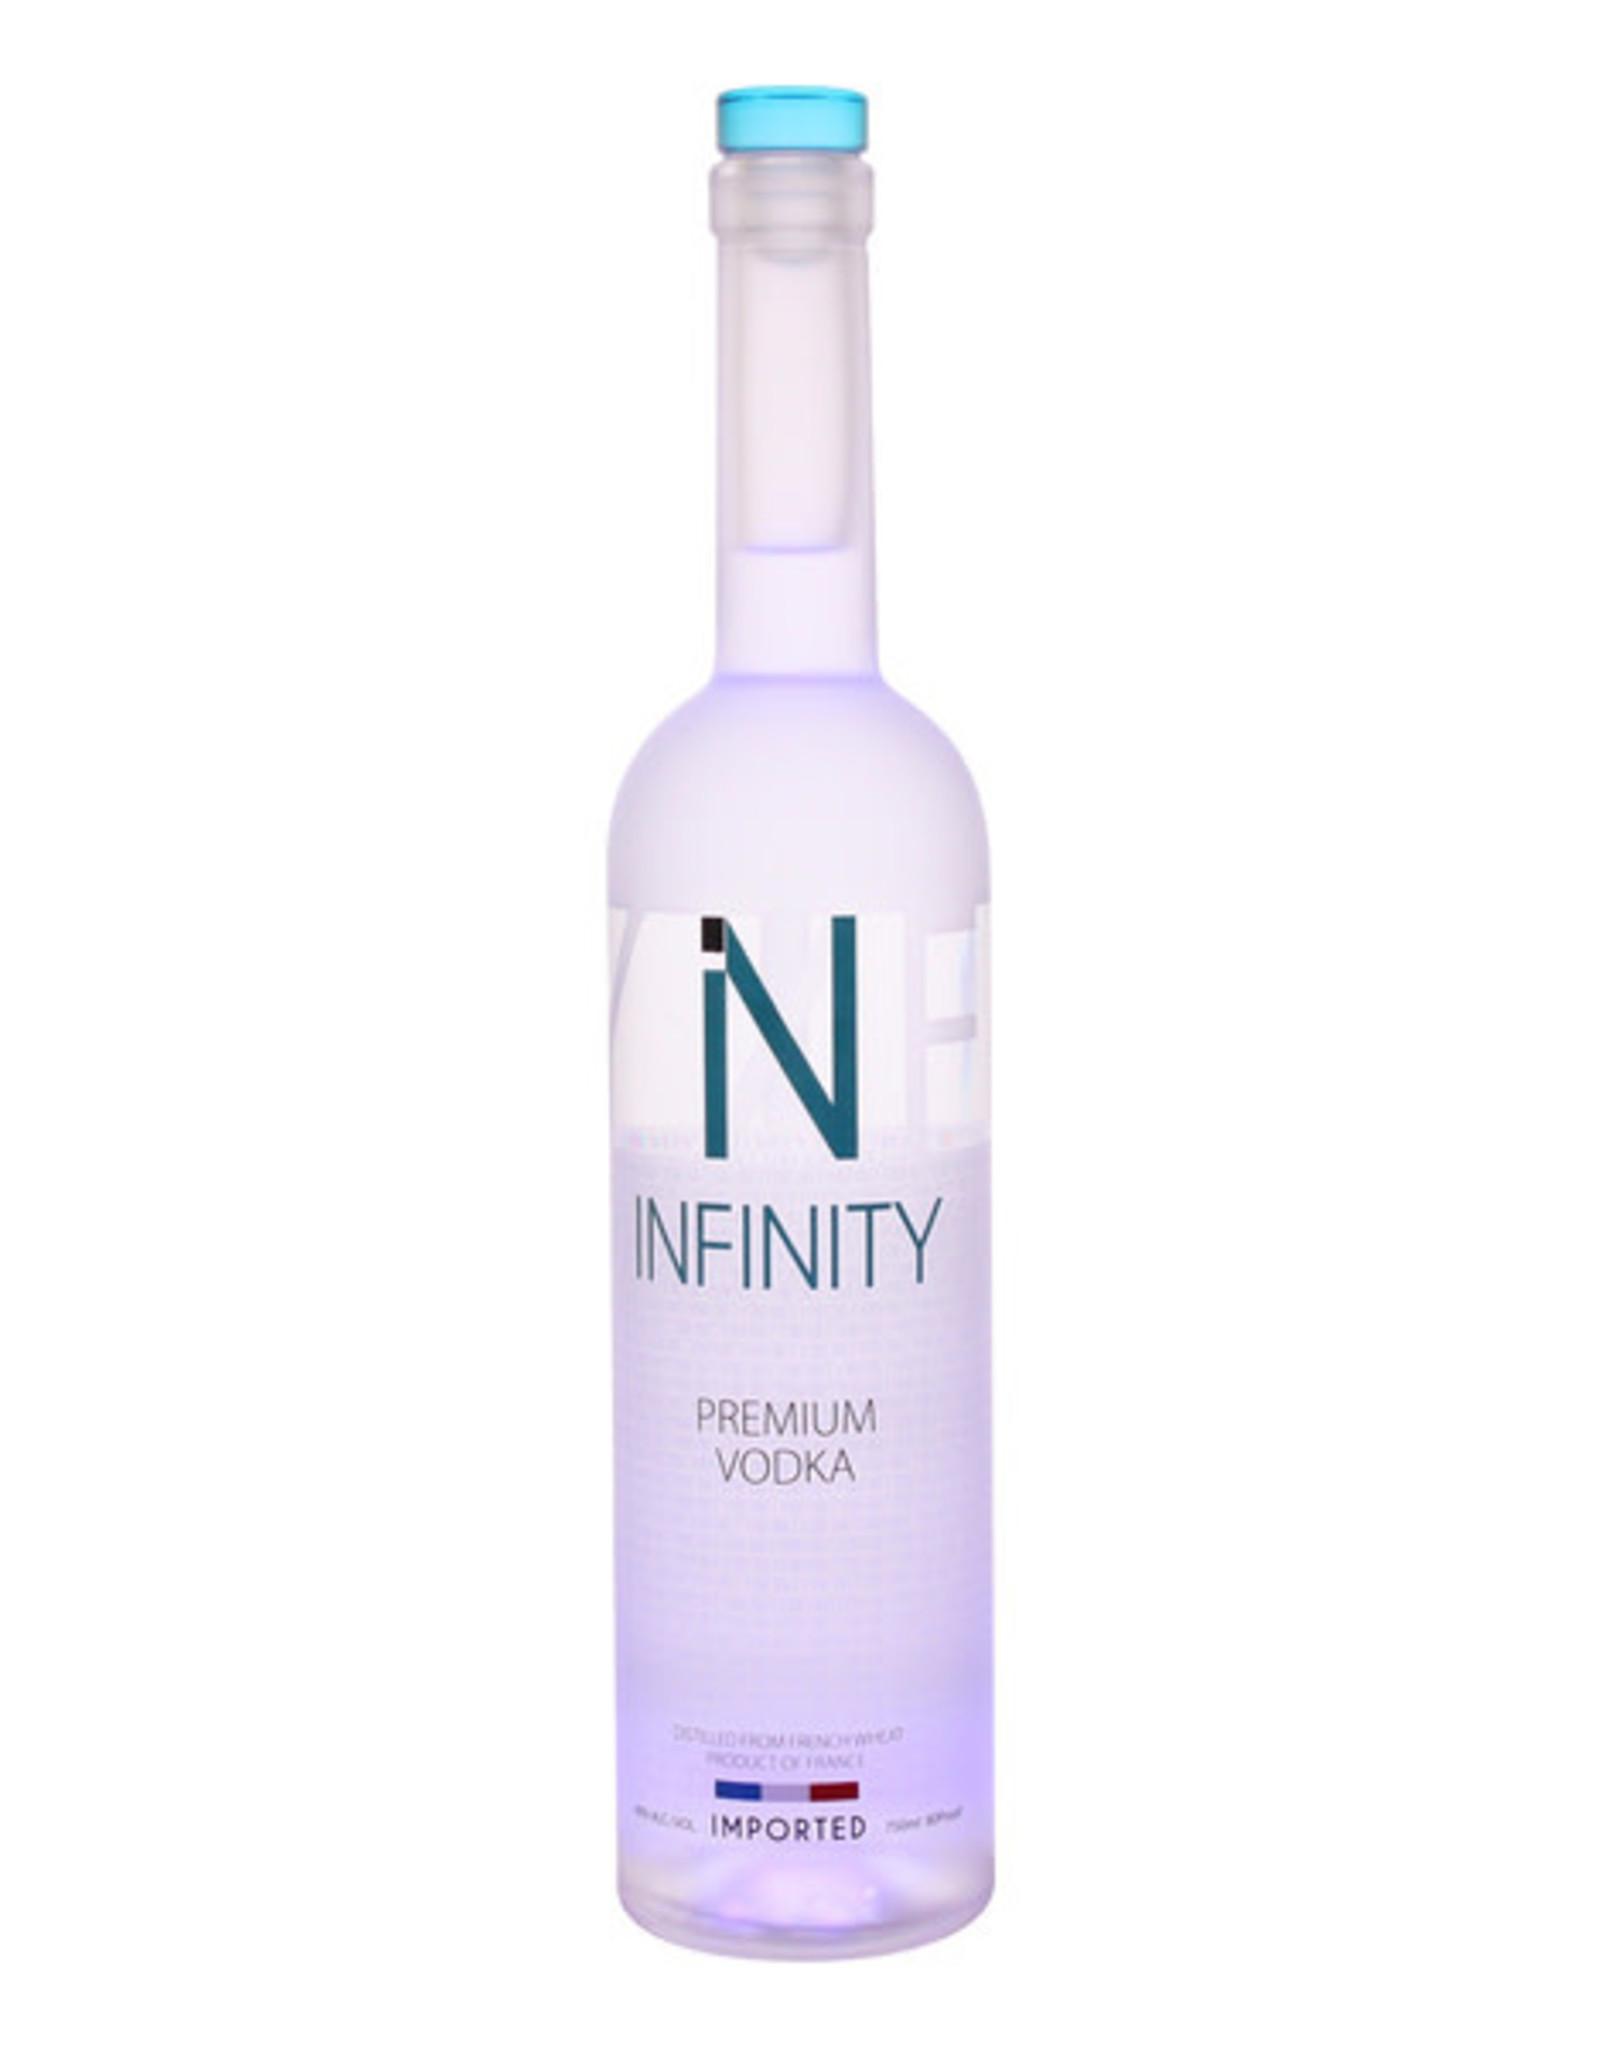 INFINITY PREMIUM VODKA 1.75ml